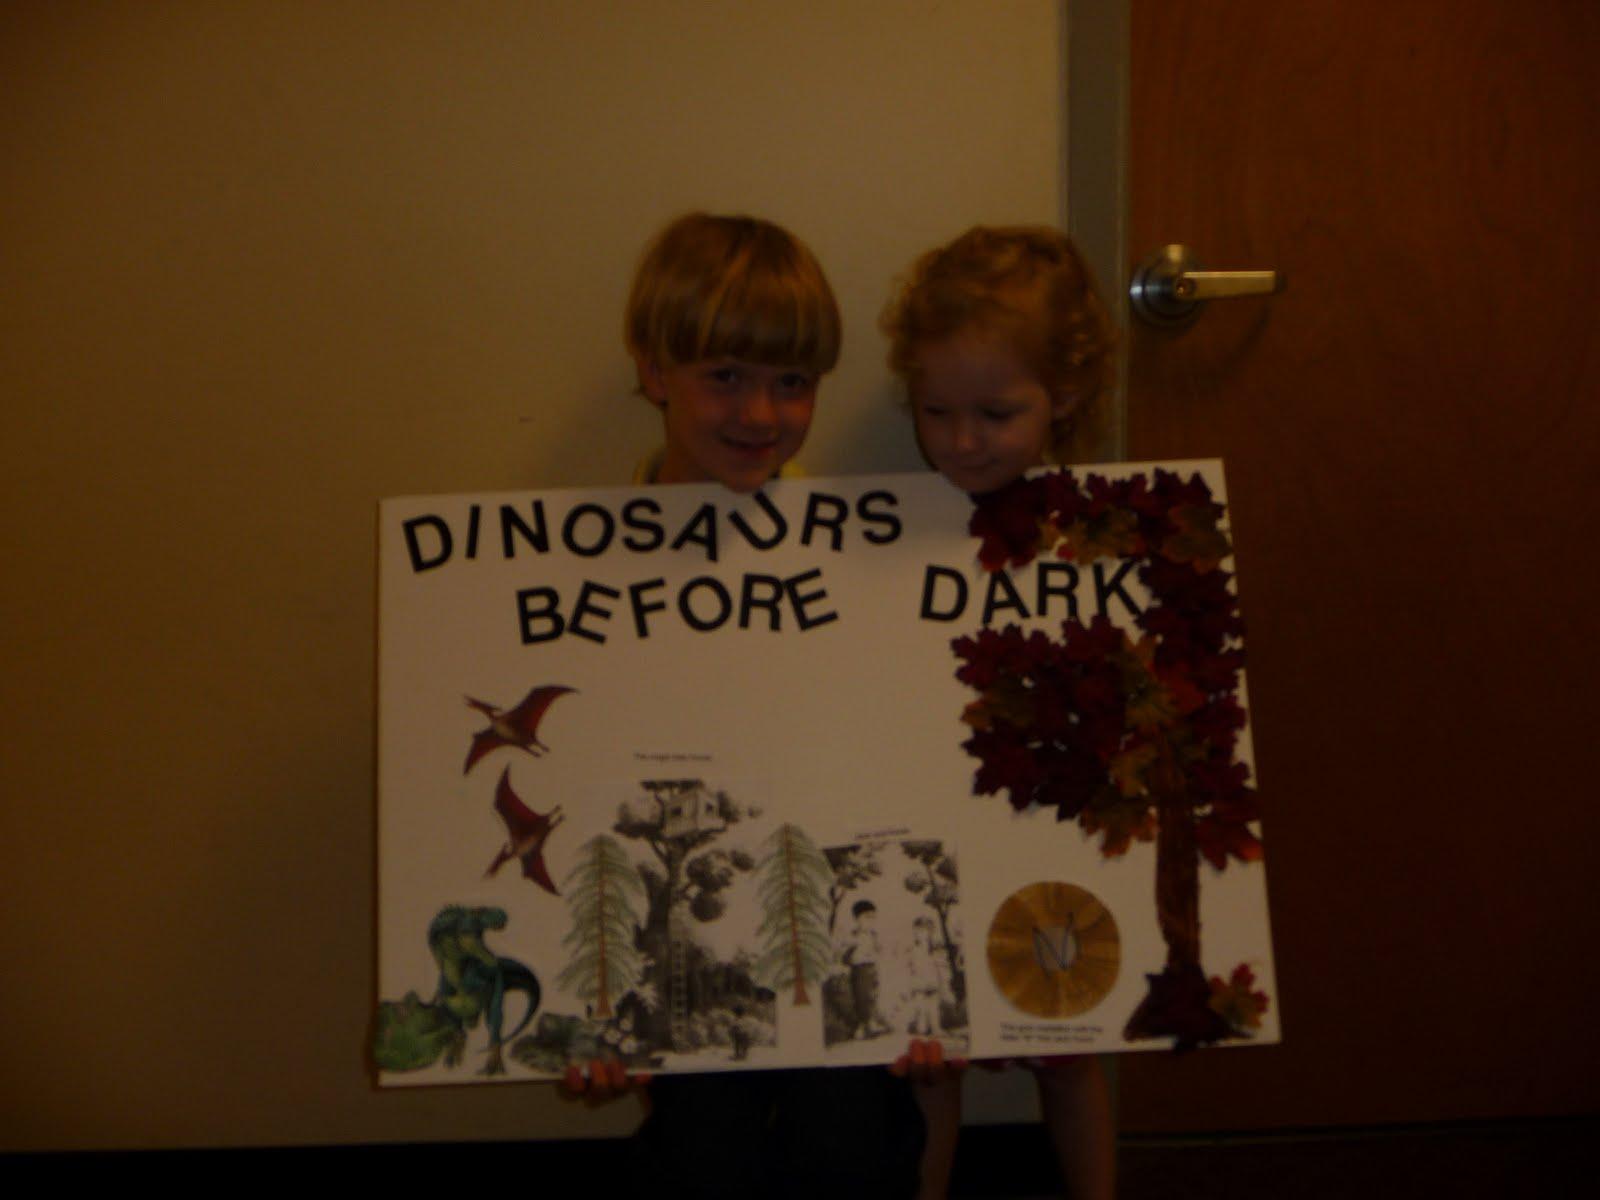 A Mother S Heartstrings Volume 4 Dinosaurs Before Dark